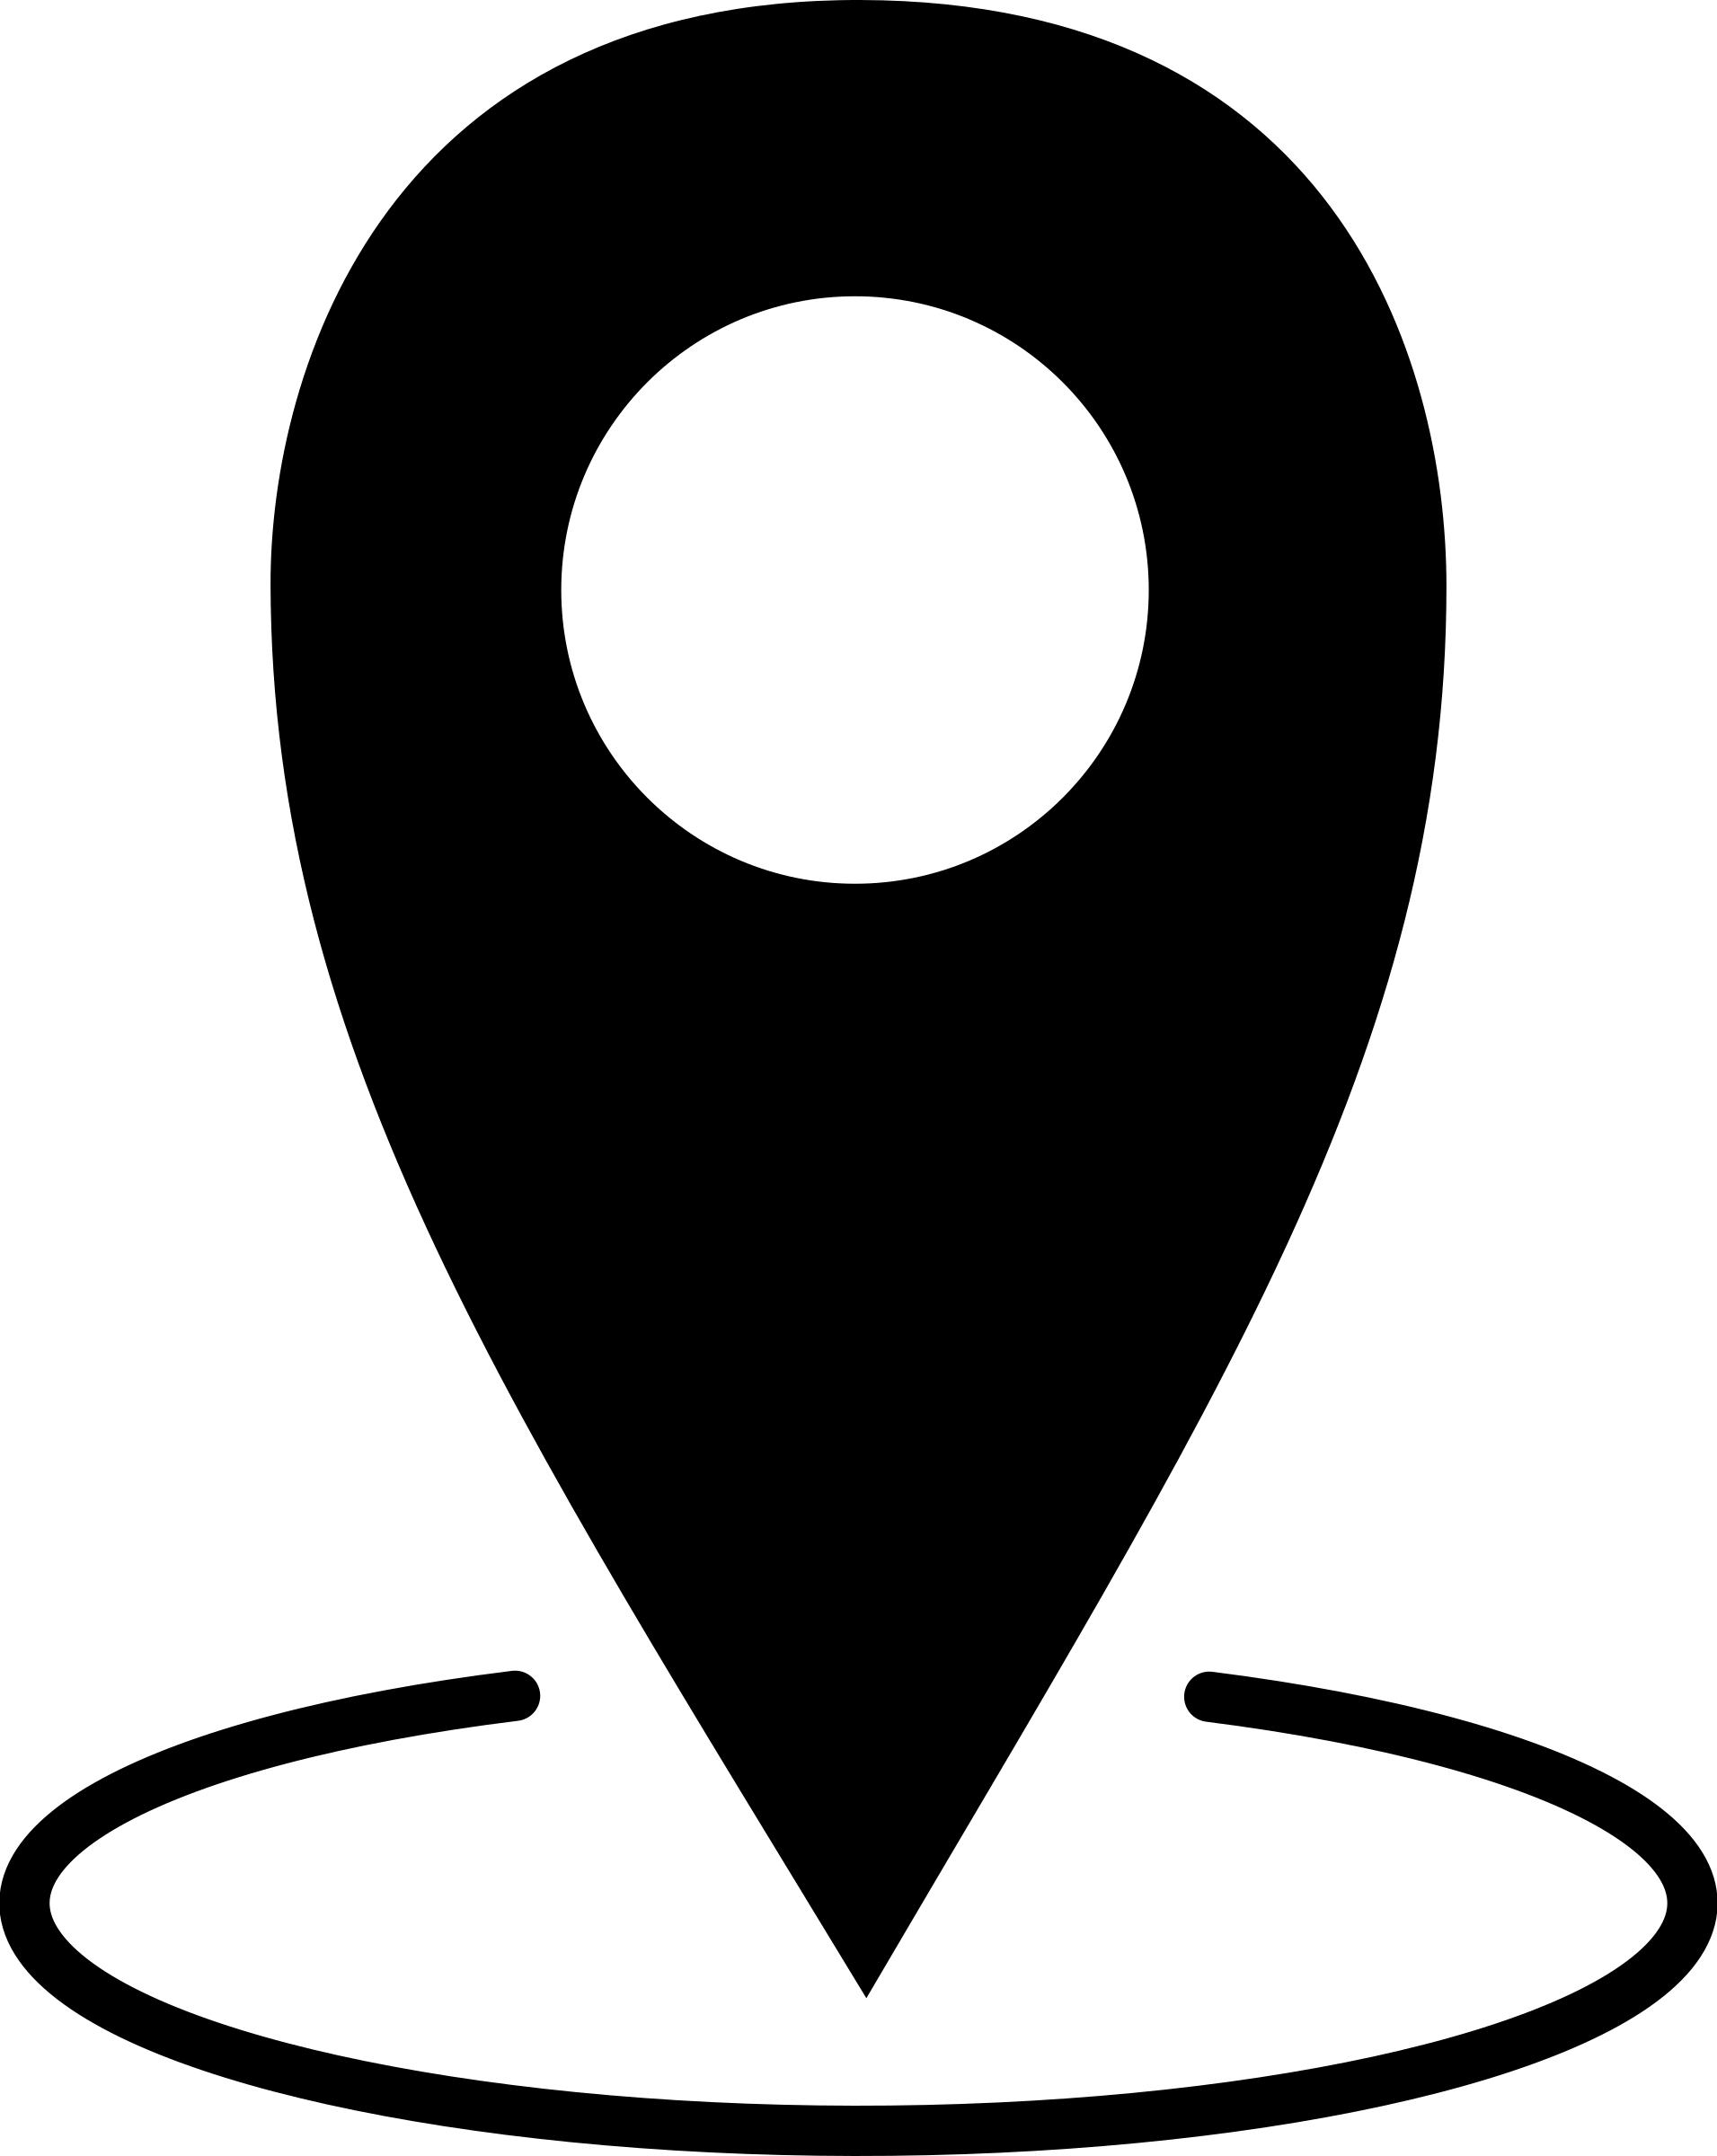 Location (GPS) Symbol #40991.